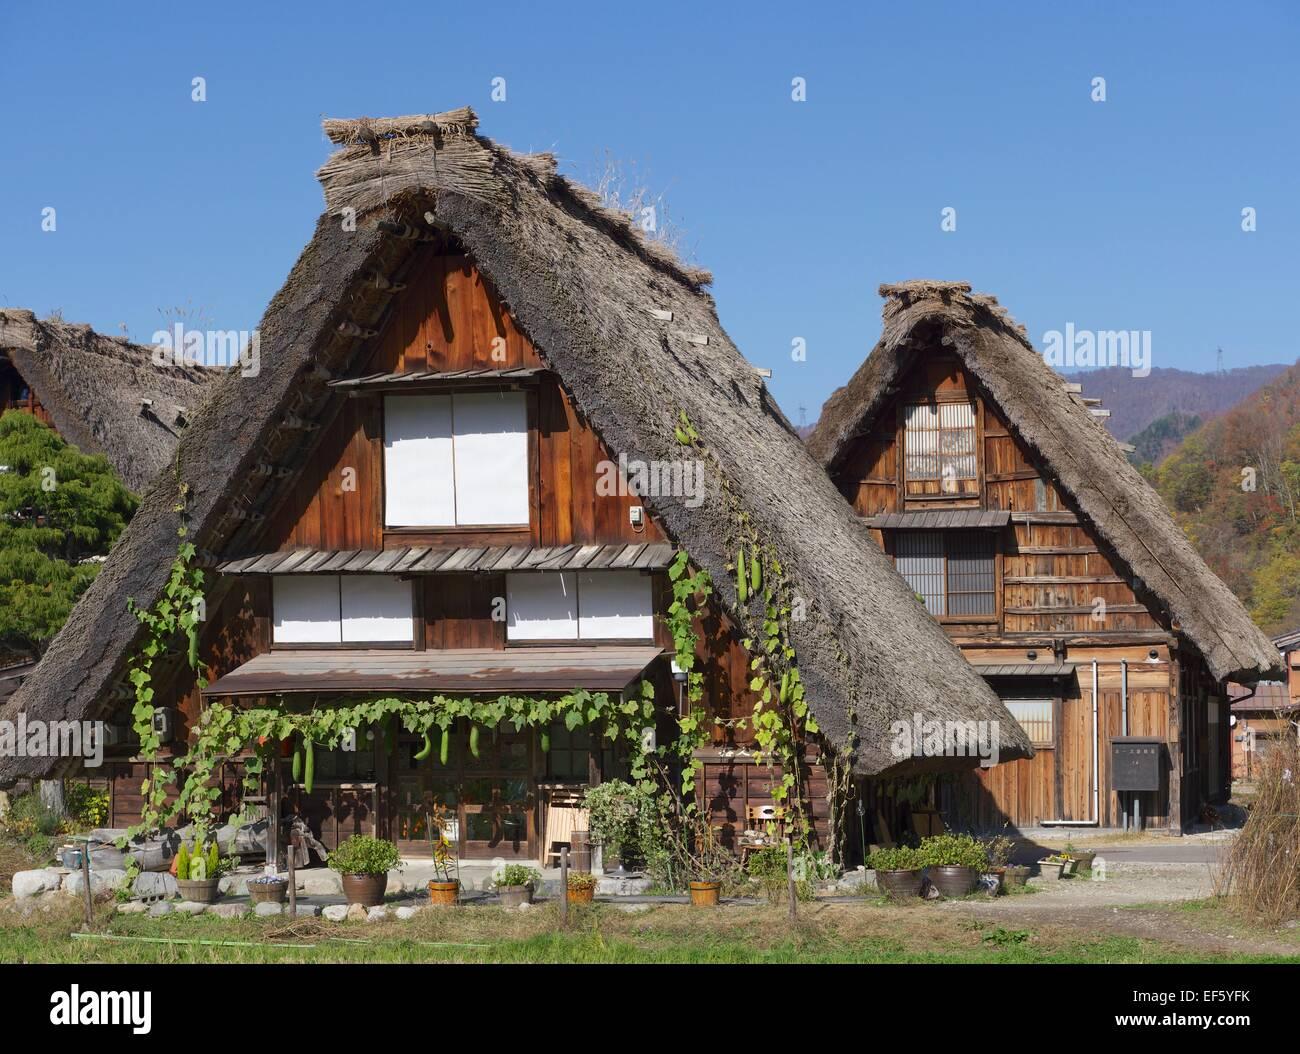 Strohgedeckten Häuser in Shirakawago in Japan Stockfoto, Bild ...